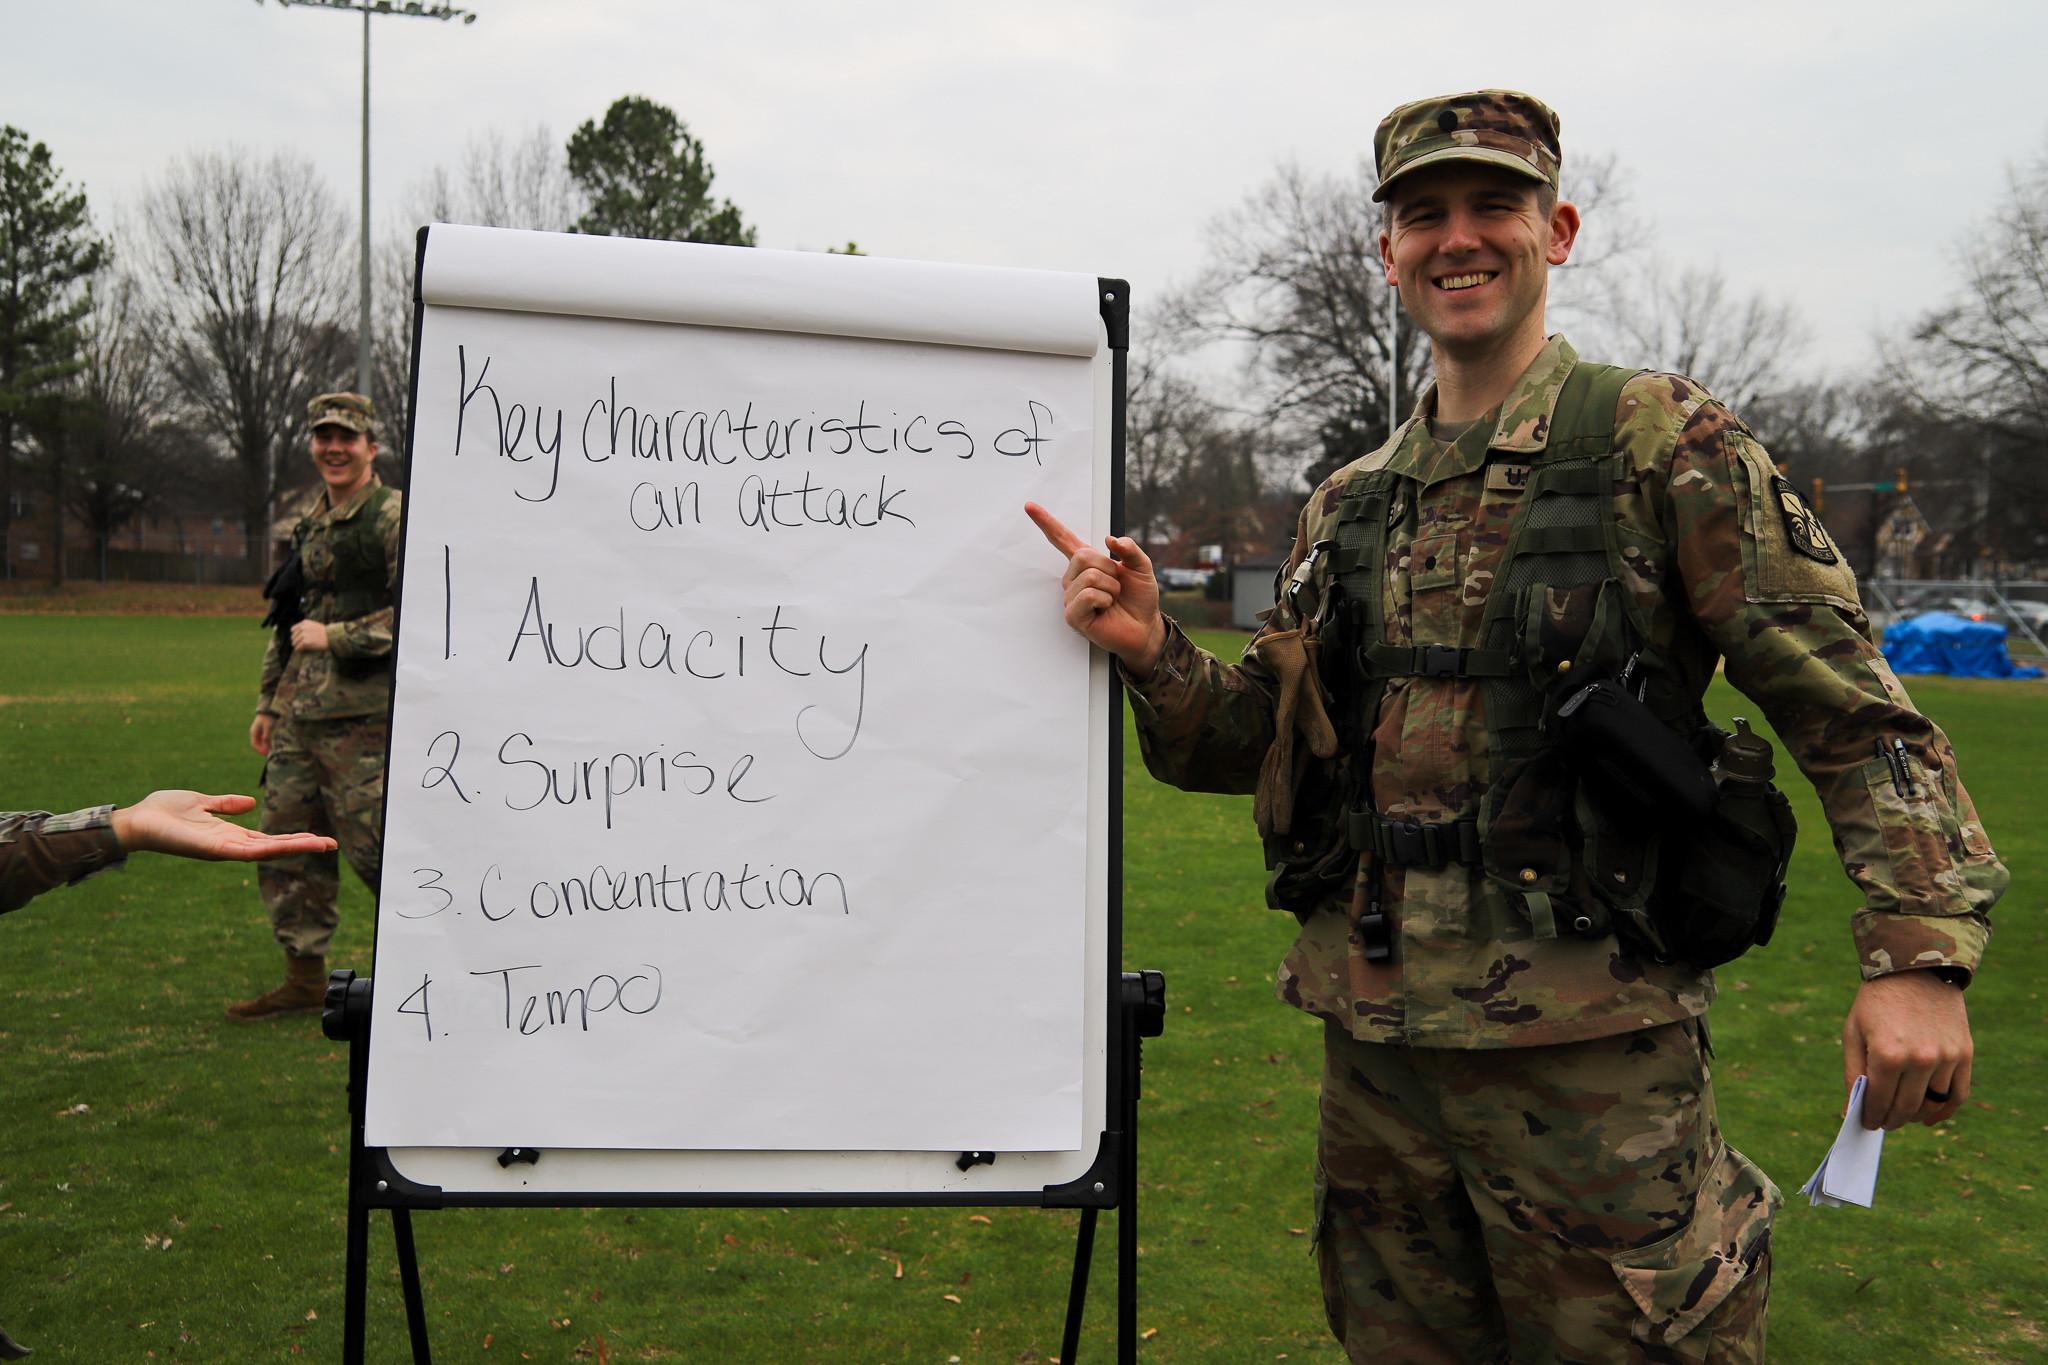 February's Highlighted Cadet: Harrison Ryder